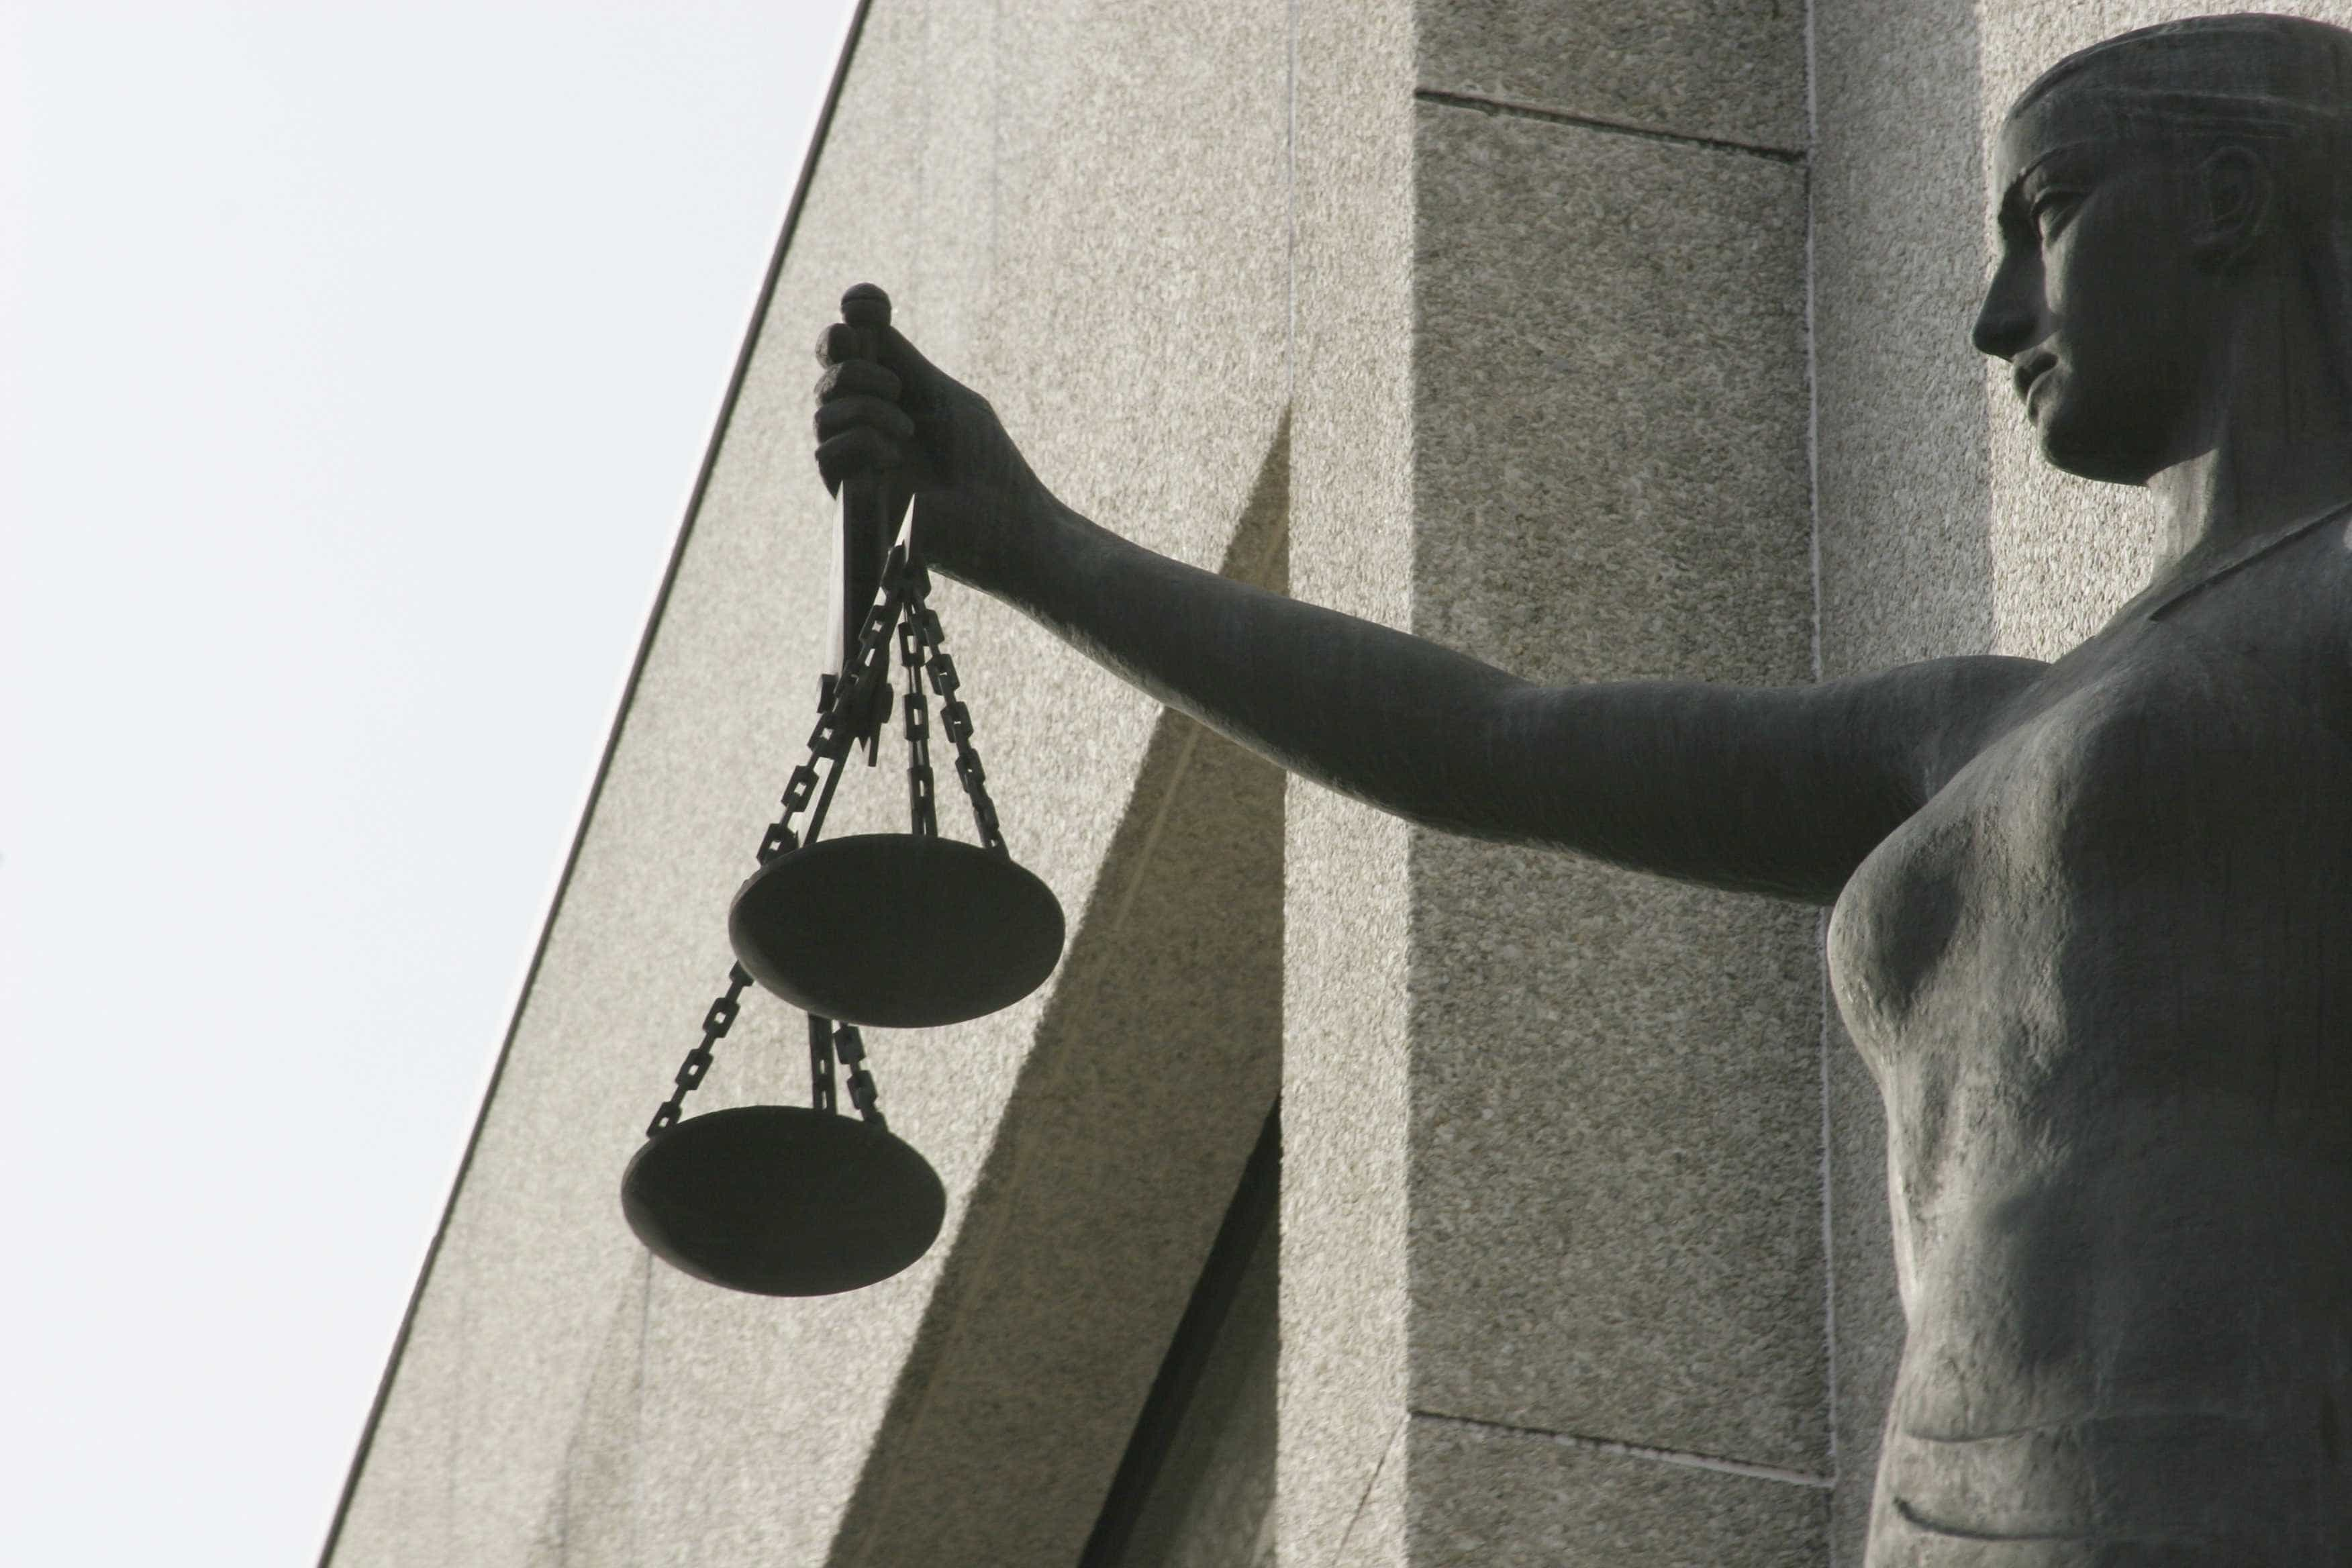 Mulher confessa desvio de 201 mil euros da cooperativa António Sérgio